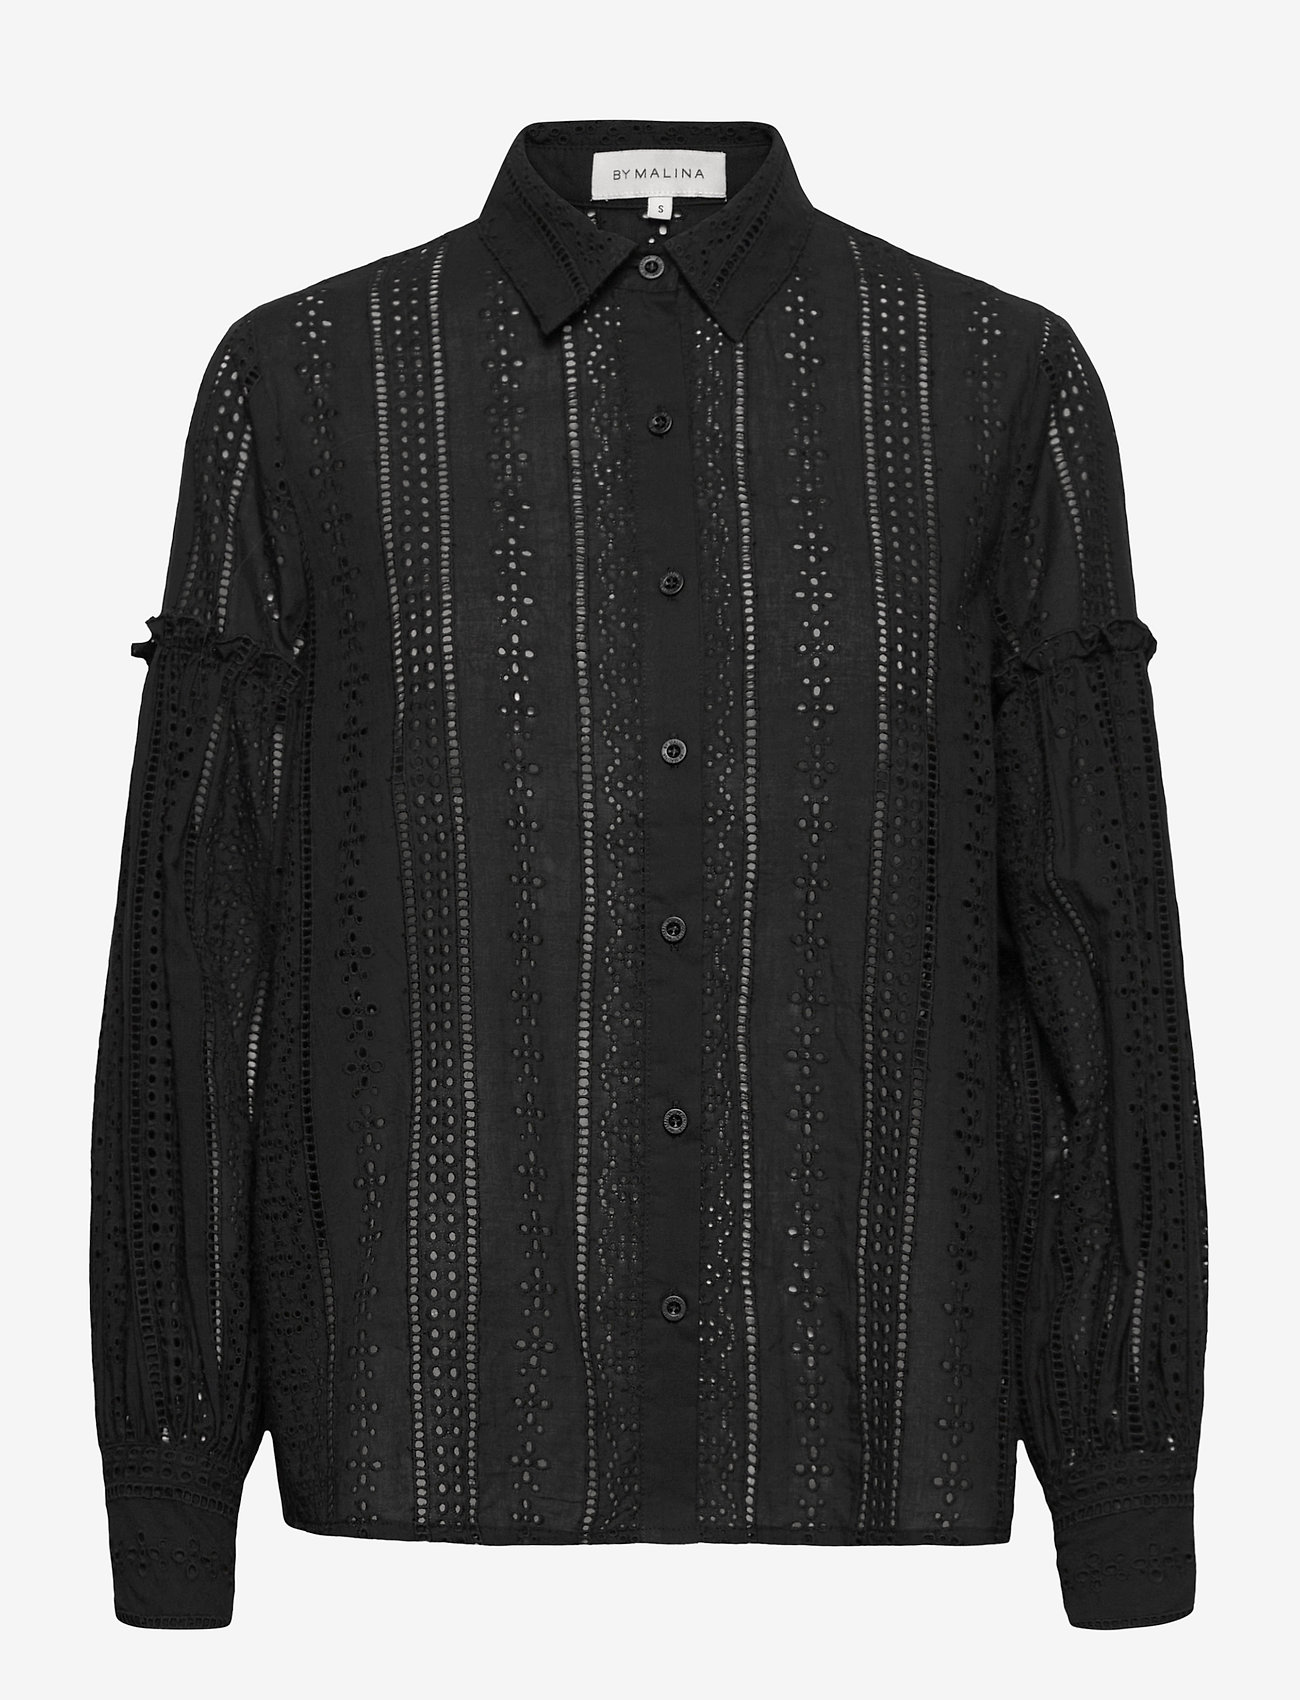 By Malina - Juno blouse - långärmade skjortor - black - 1